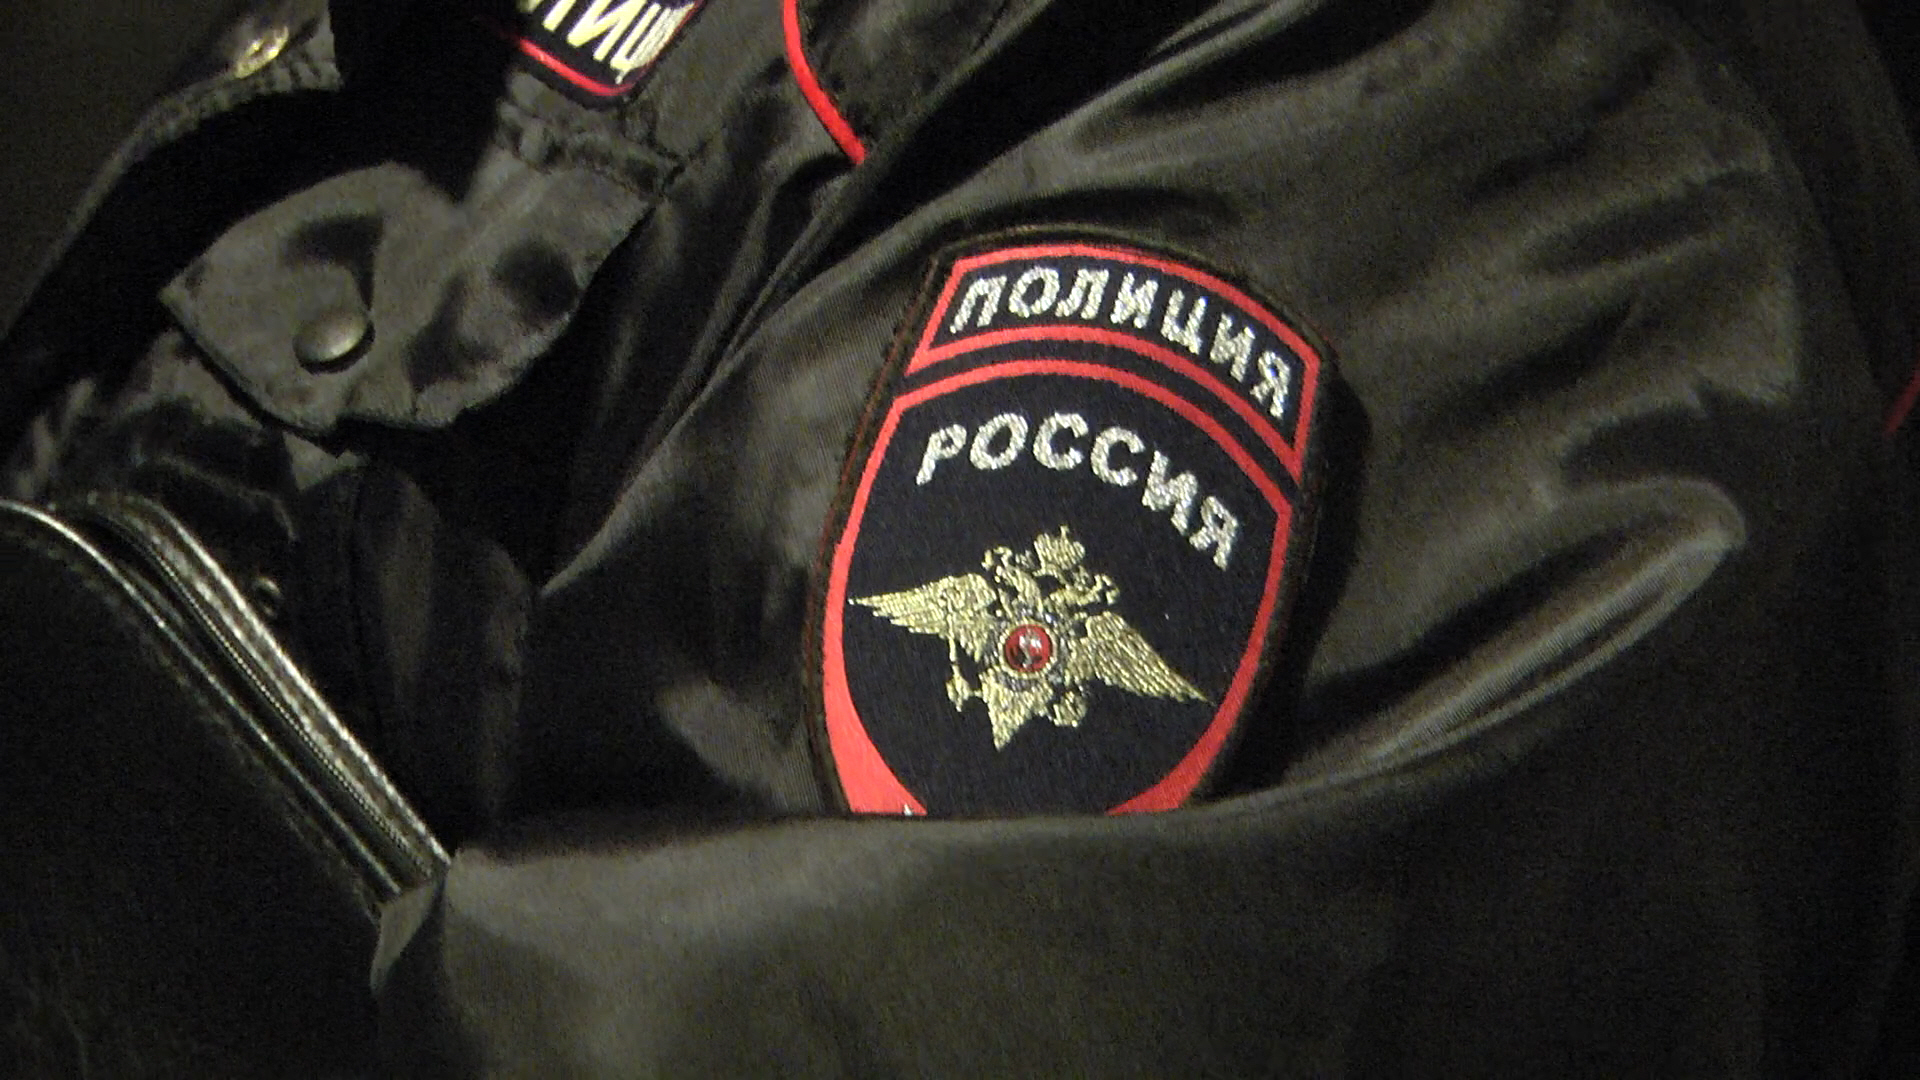 Россия, Полиция, Криминал, Активист, путин, Ямадаев.